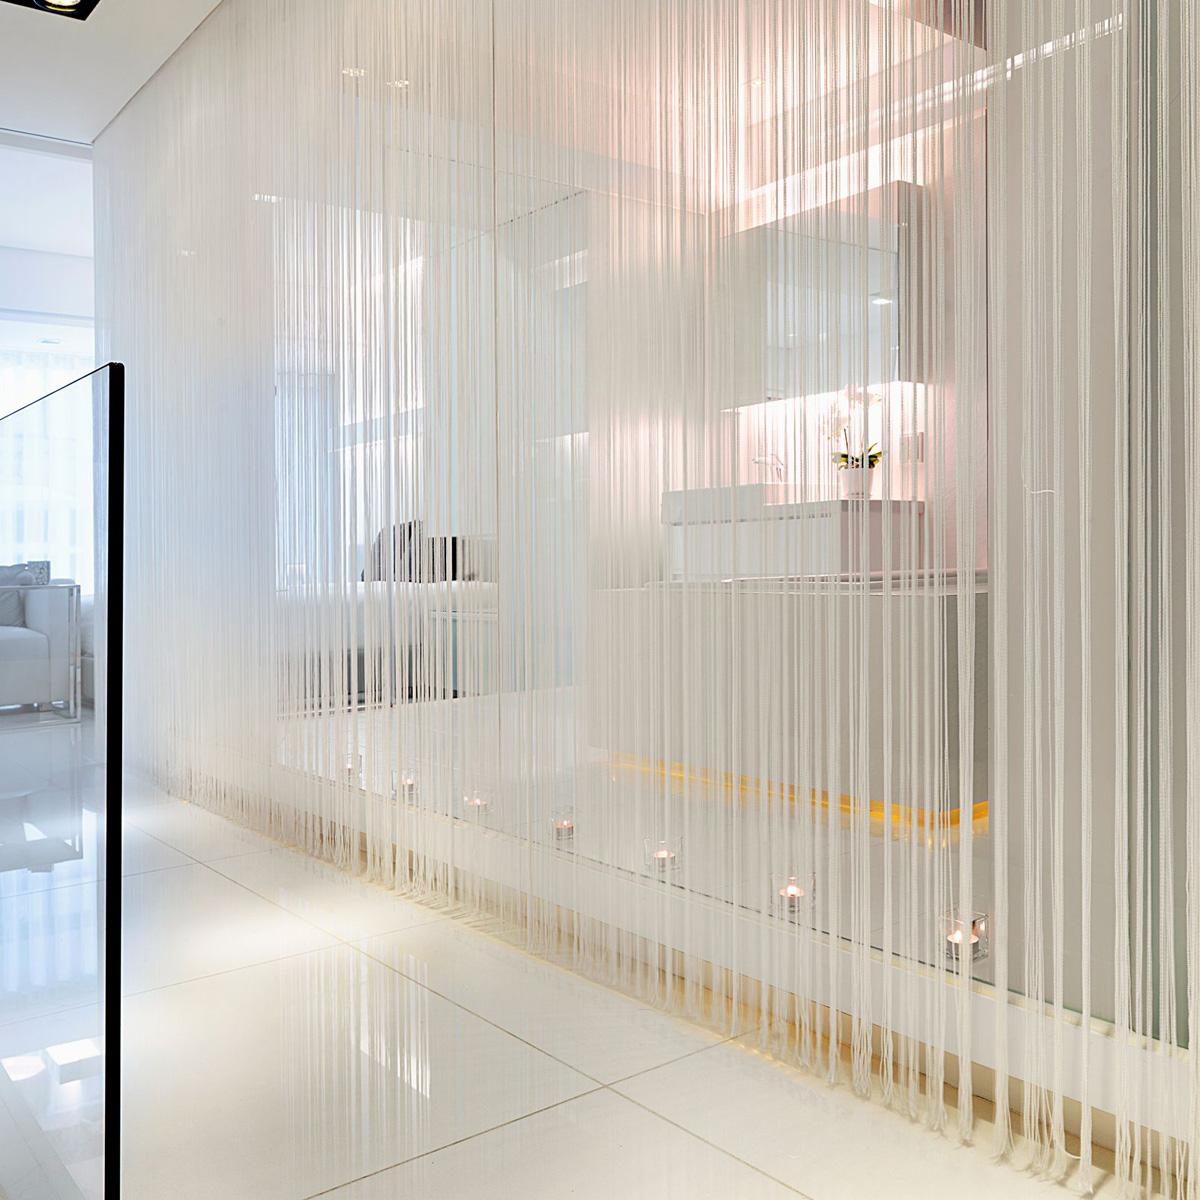 UK Curtain Glitter String Panels Tassel Fly Screen Room Divider